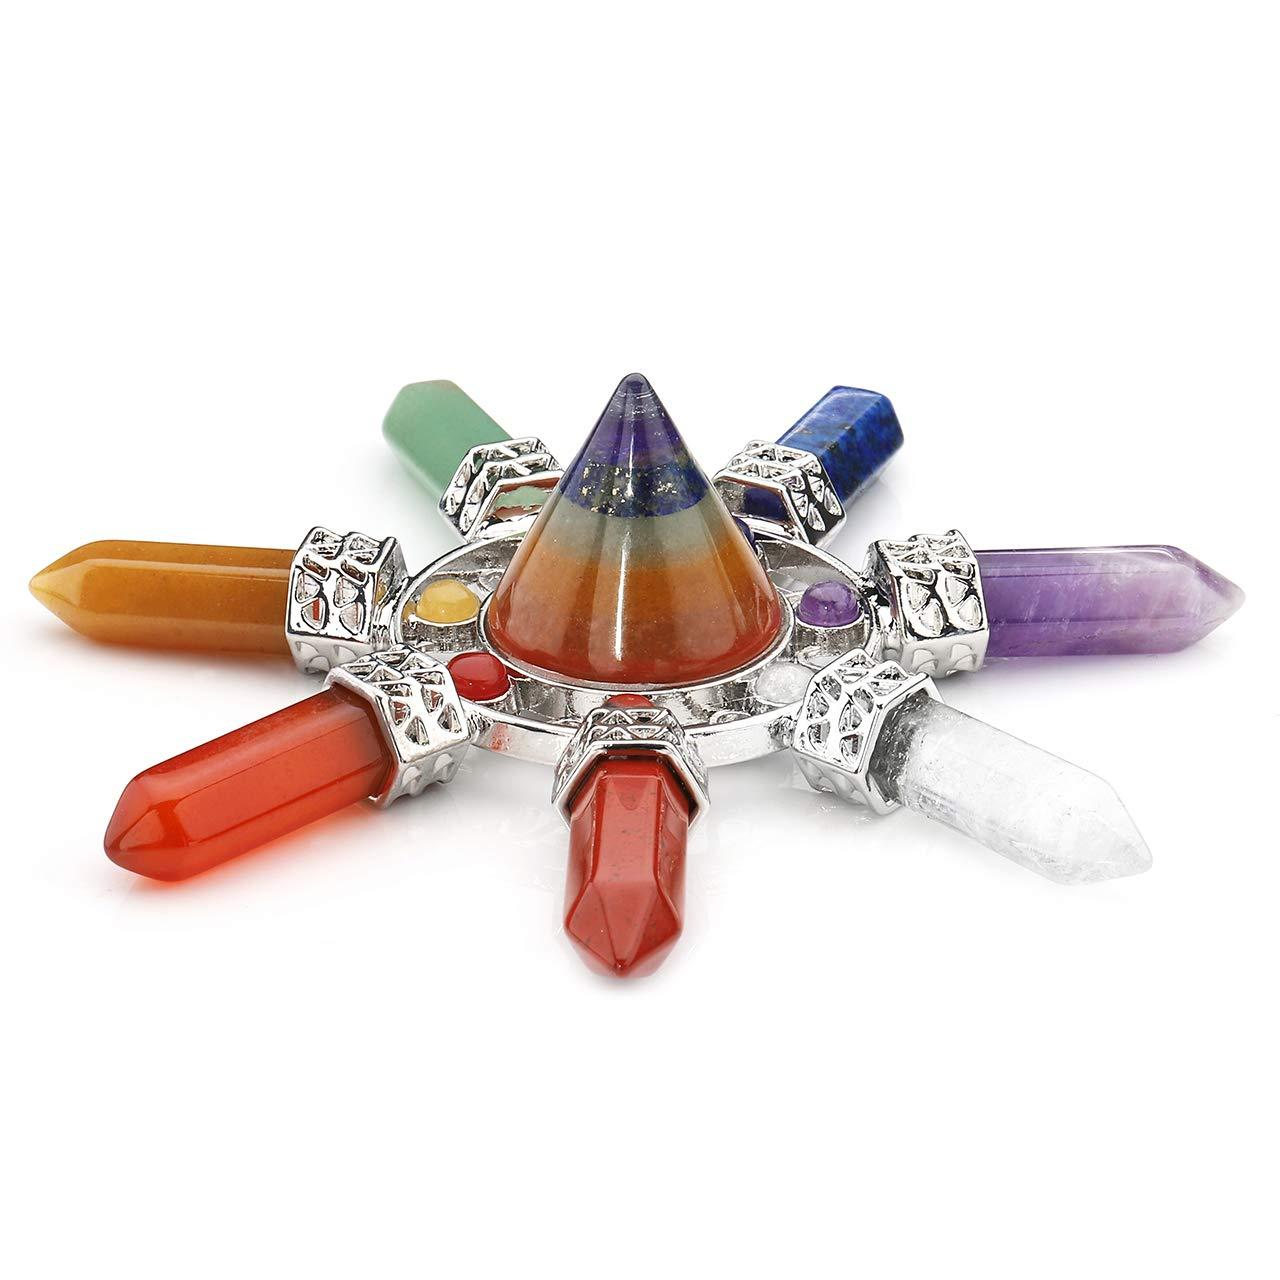 Jovivi Pyramid Crystal Energy Generator Chakra Stone Points Seven Direction 7 Chakra Quartz Crystal Reiki Stone for Healing Meditation AJ1010108547